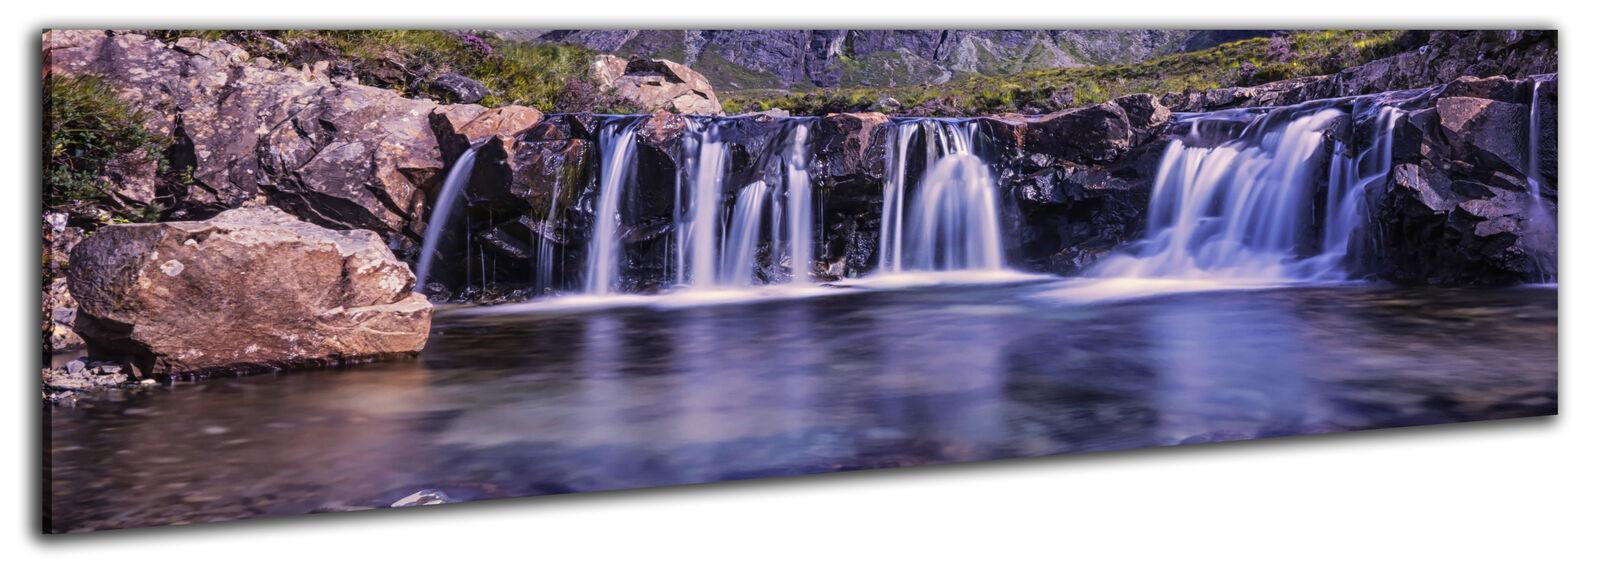 150x50cm panorama toile-La fresque Keilrahmenbild xxl cascade wasserfallla